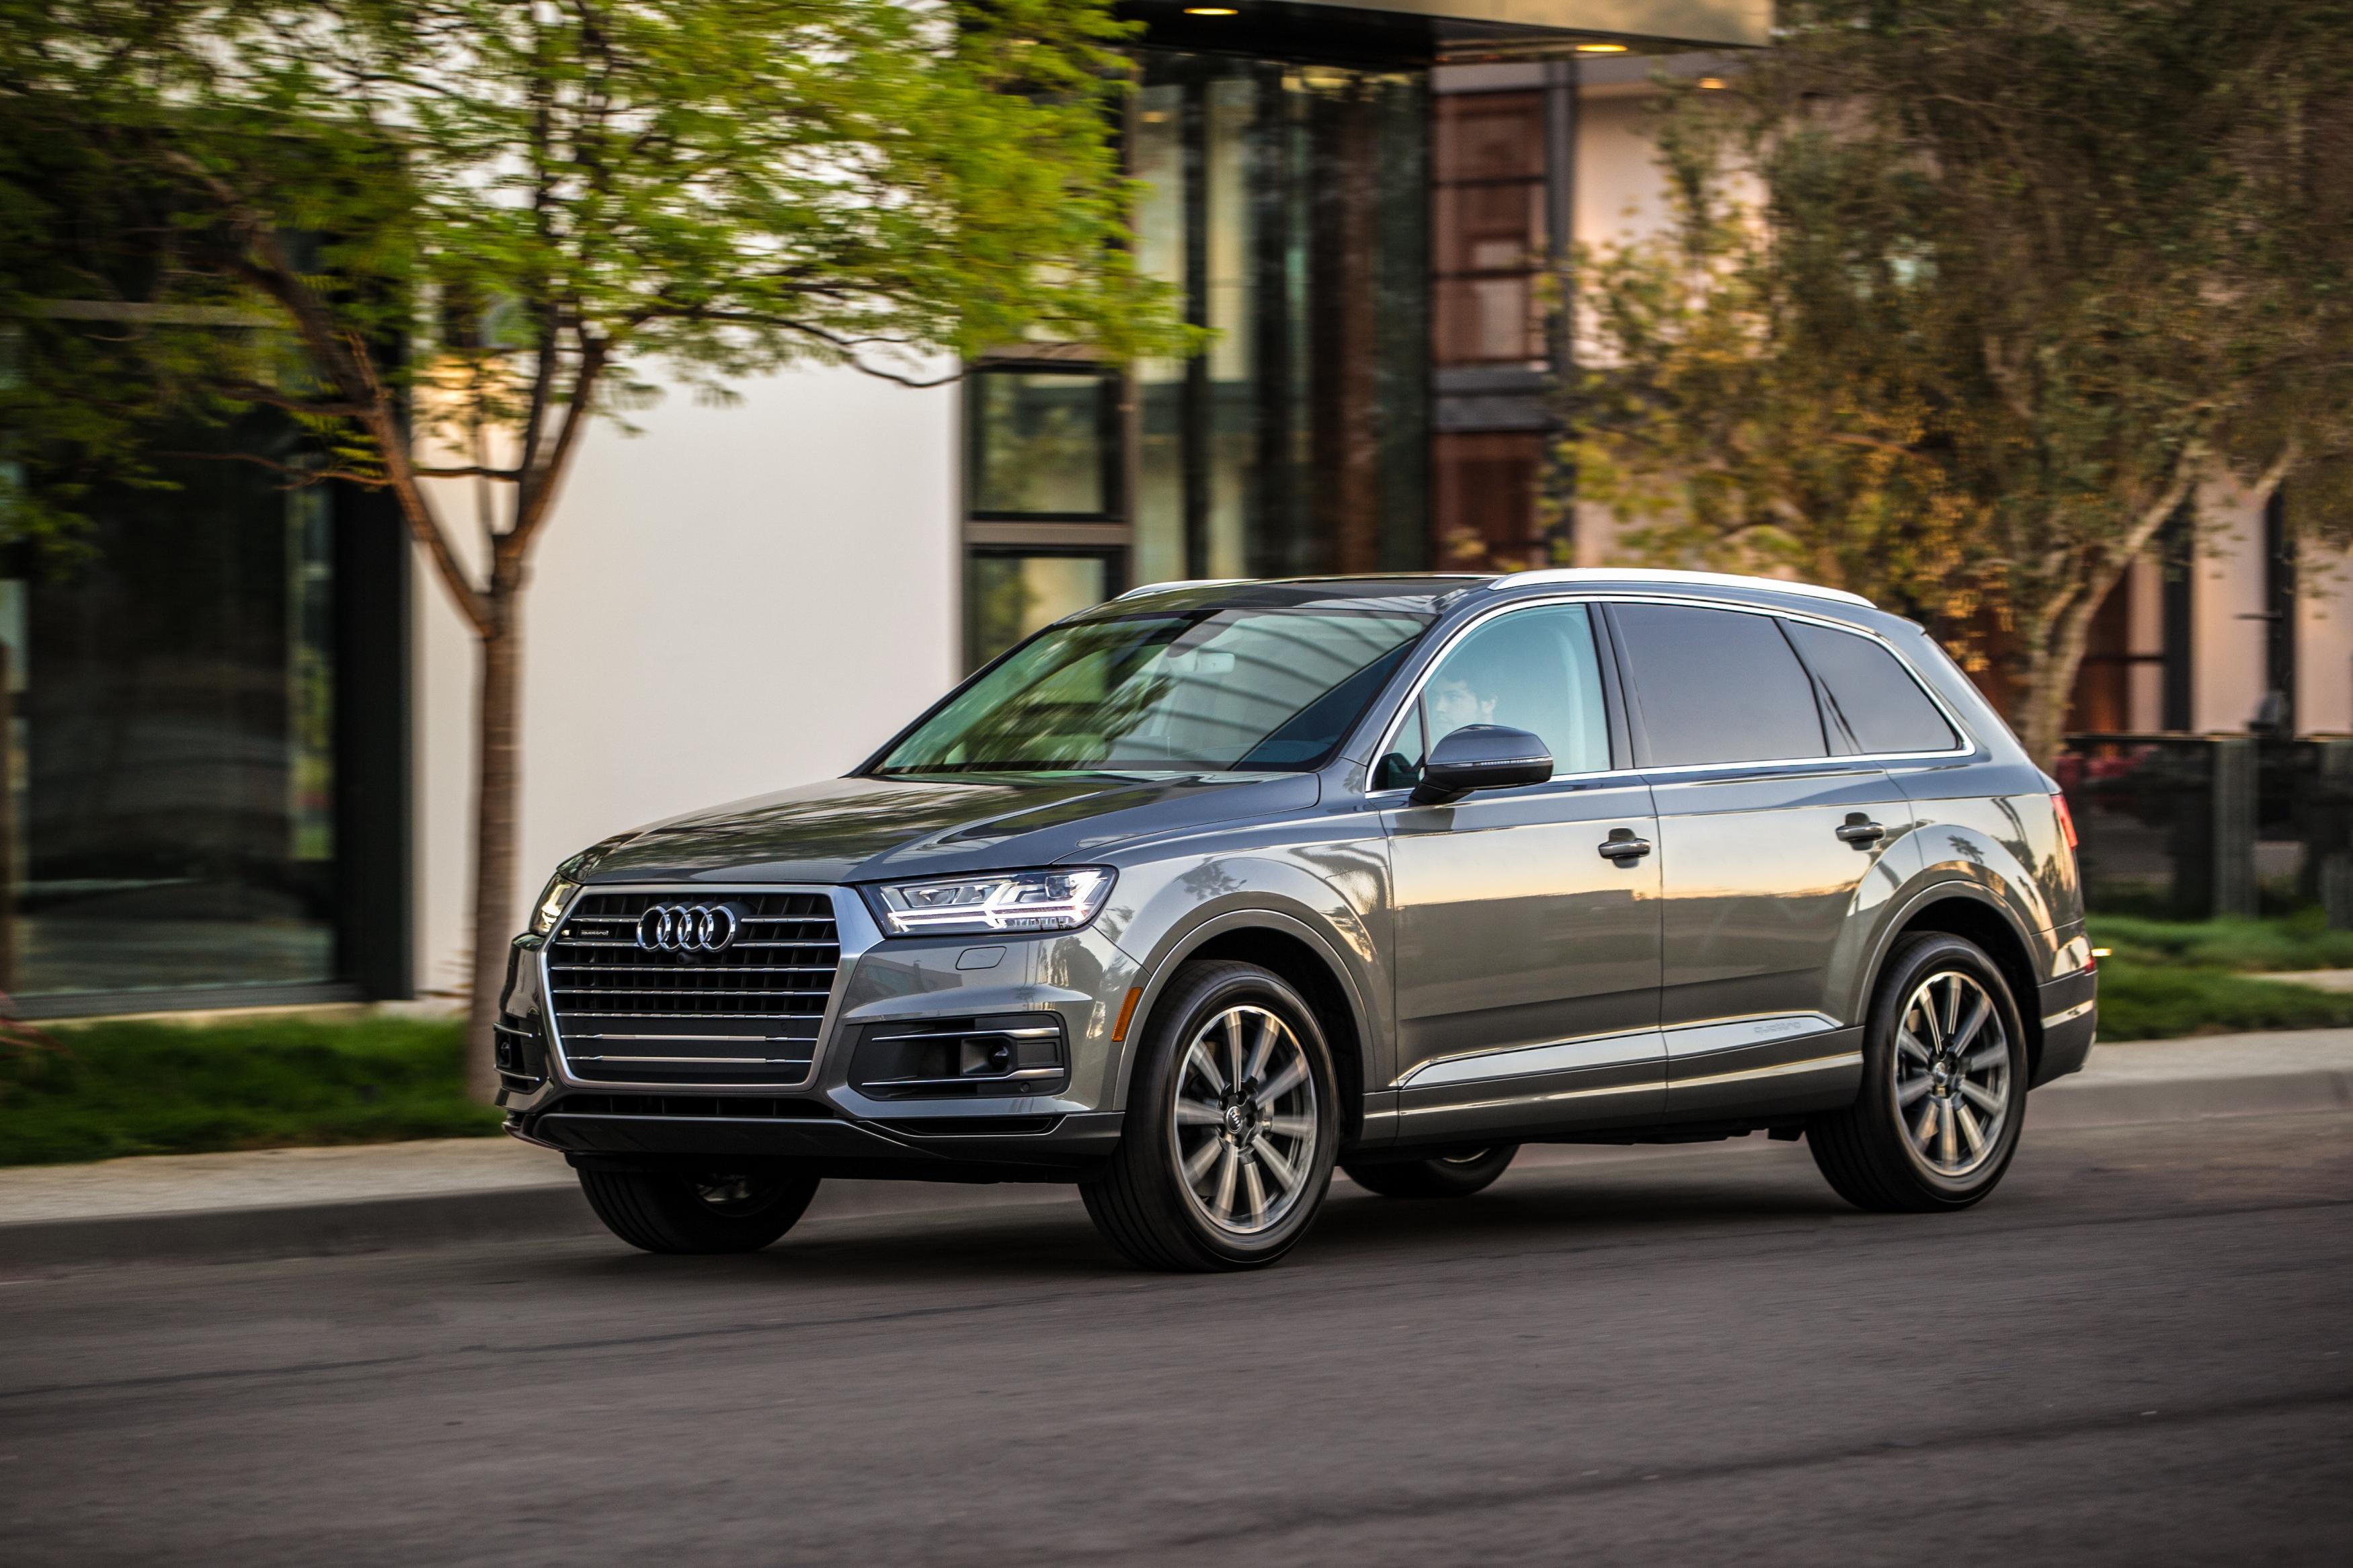 Kelebihan Audi Q7 2017 Tangguh